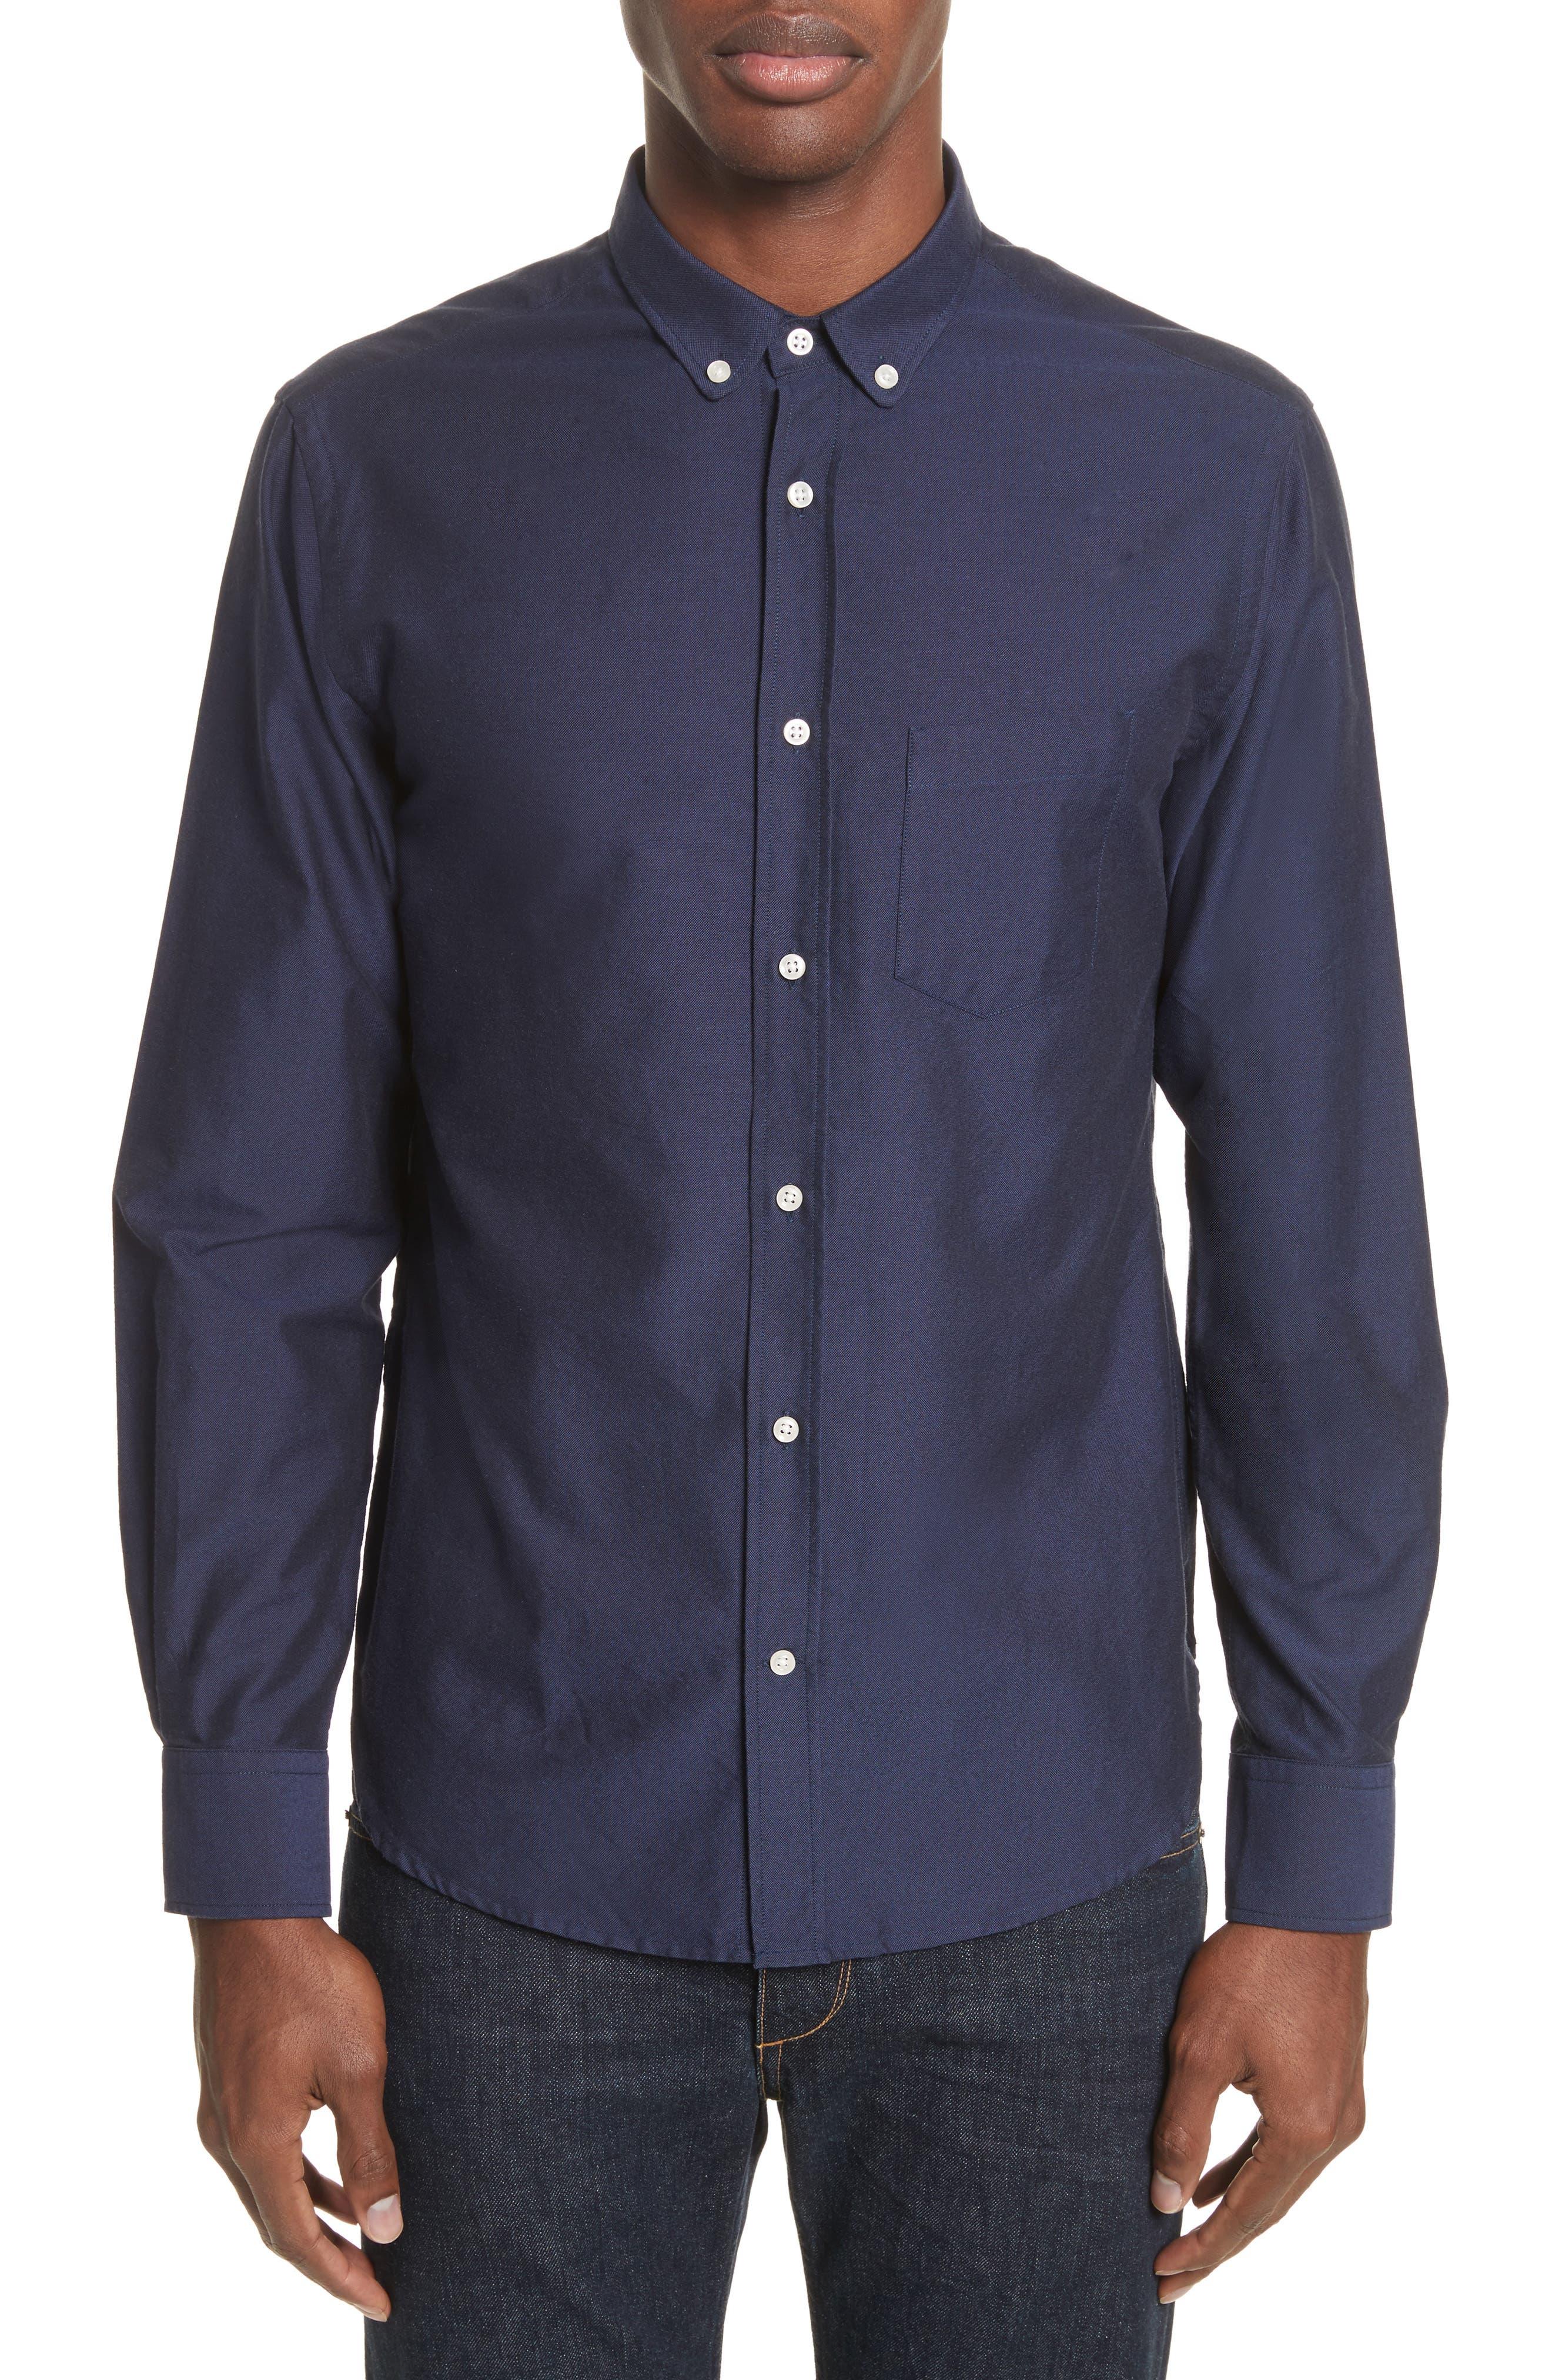 Main Image - Officine Generale Oxford Shirt